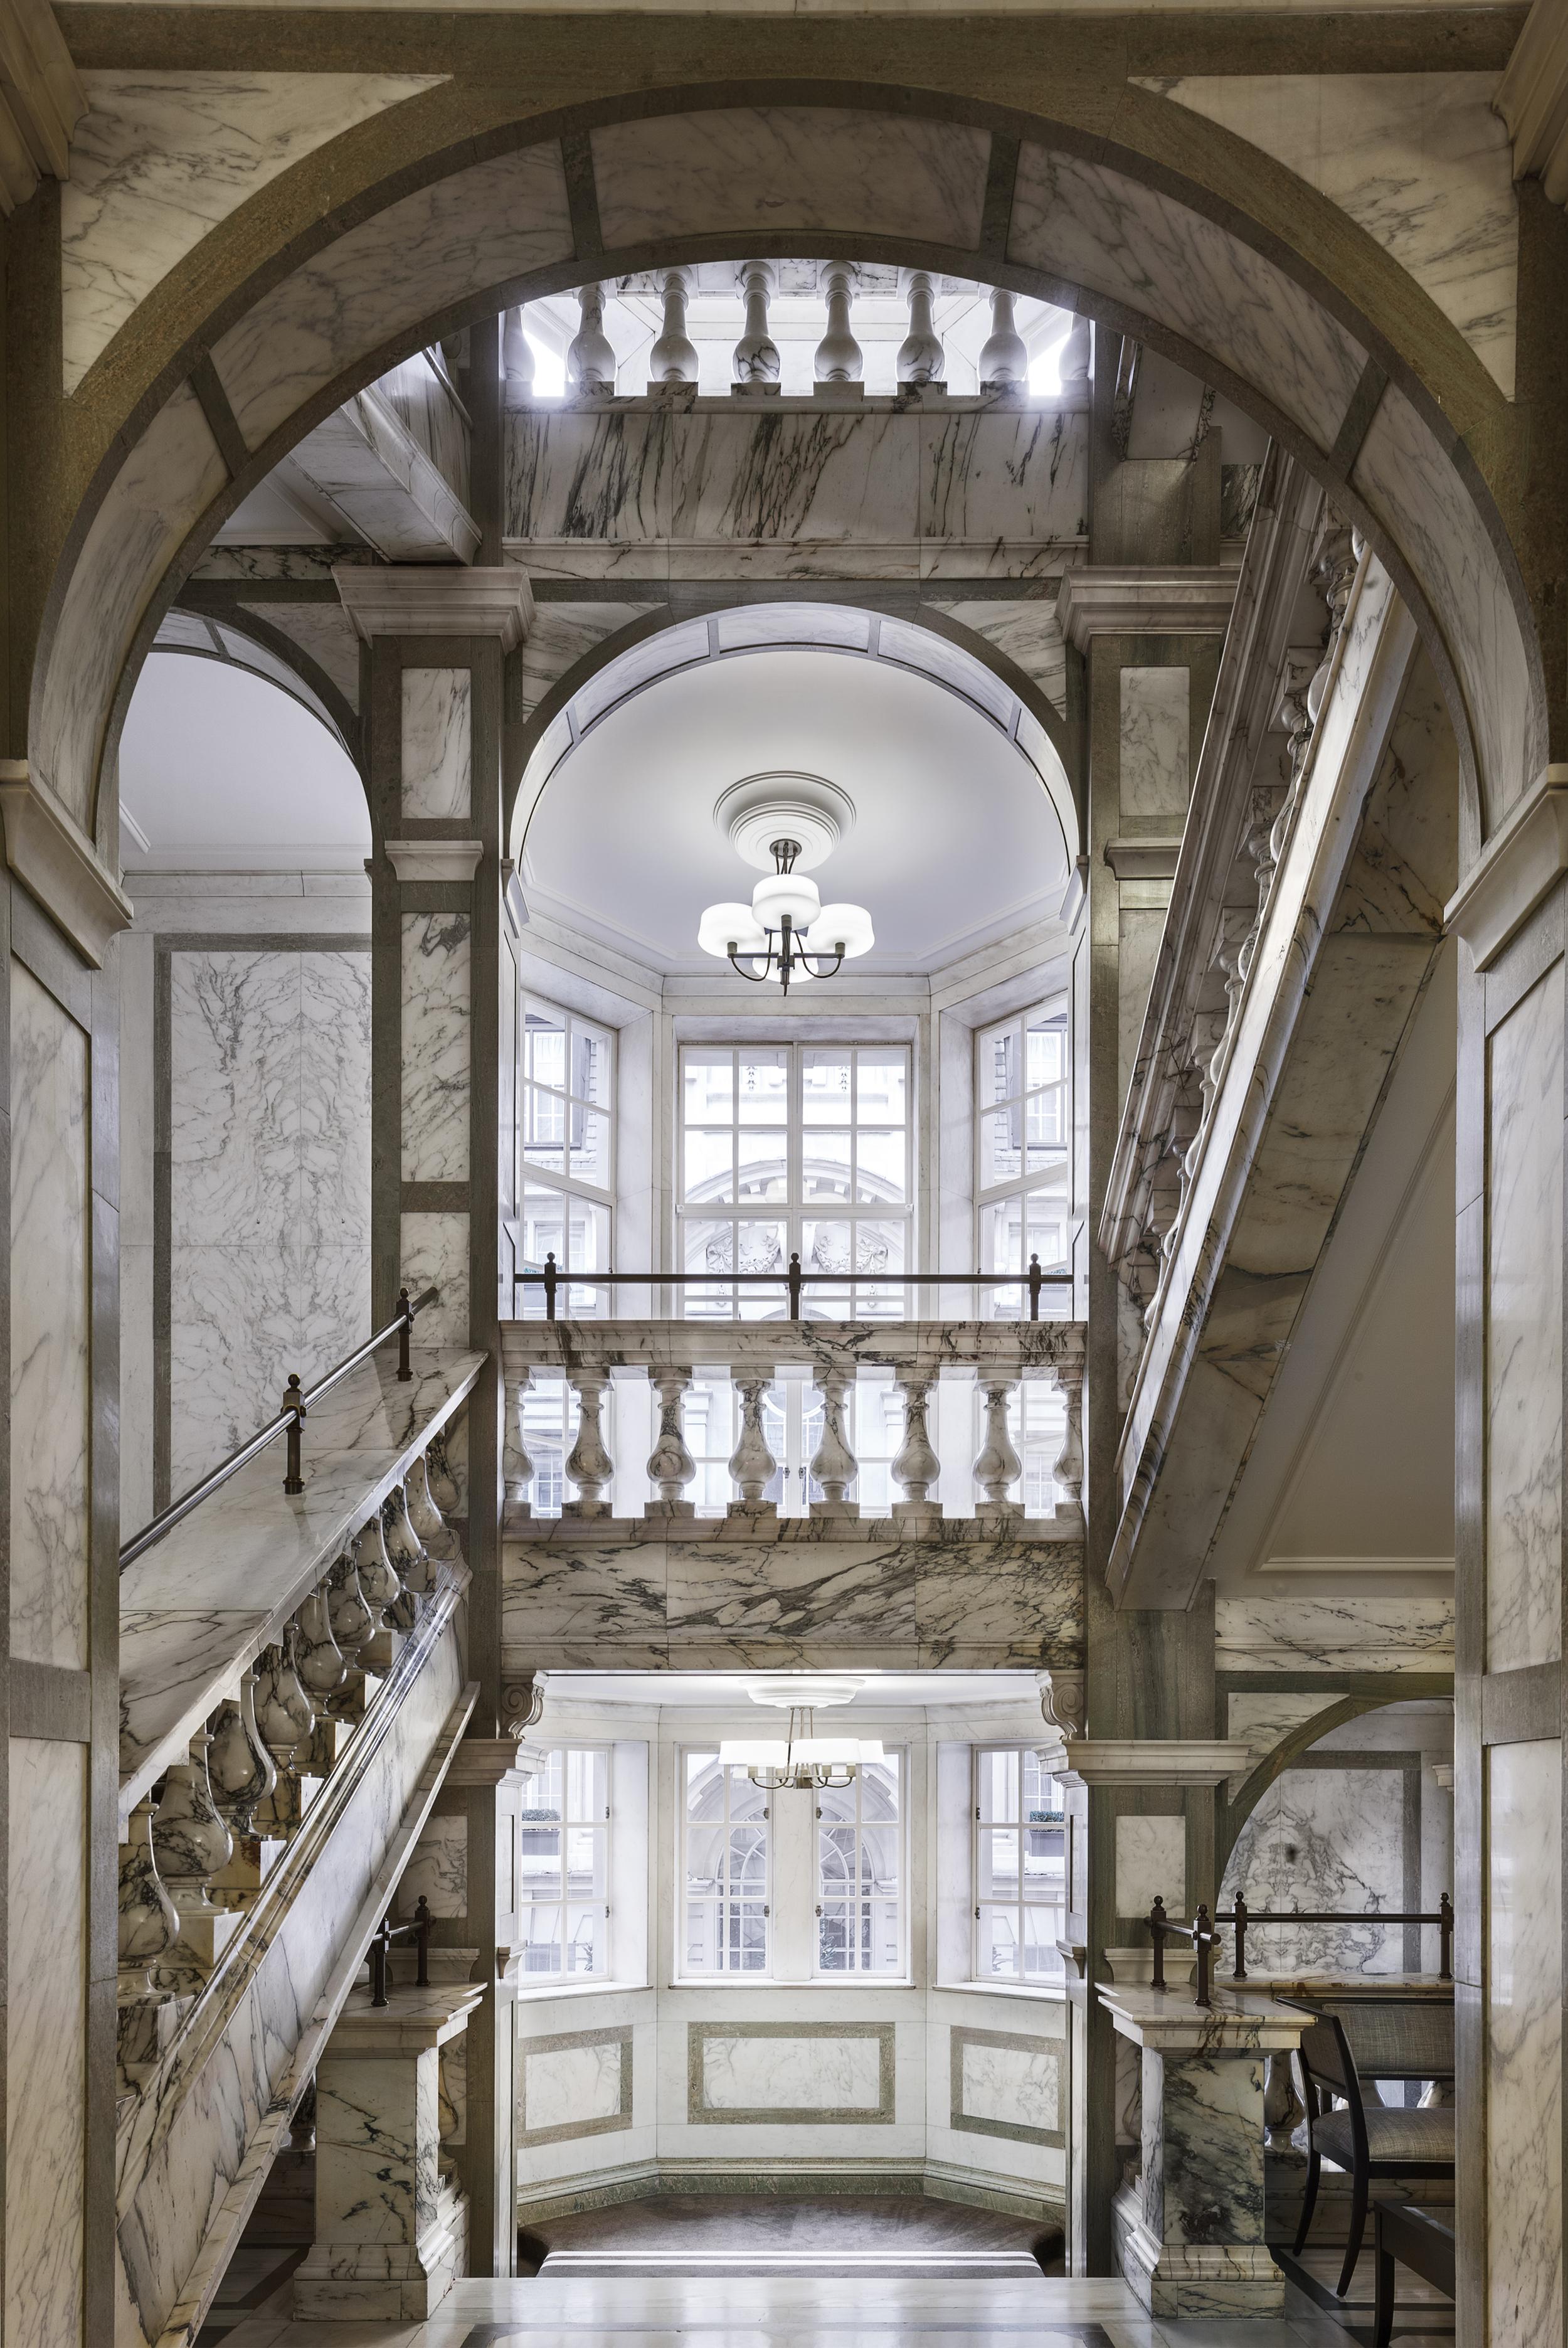 LDN_61385526_Rosewood_London_Grand_Marble_Staircase_2.jpg